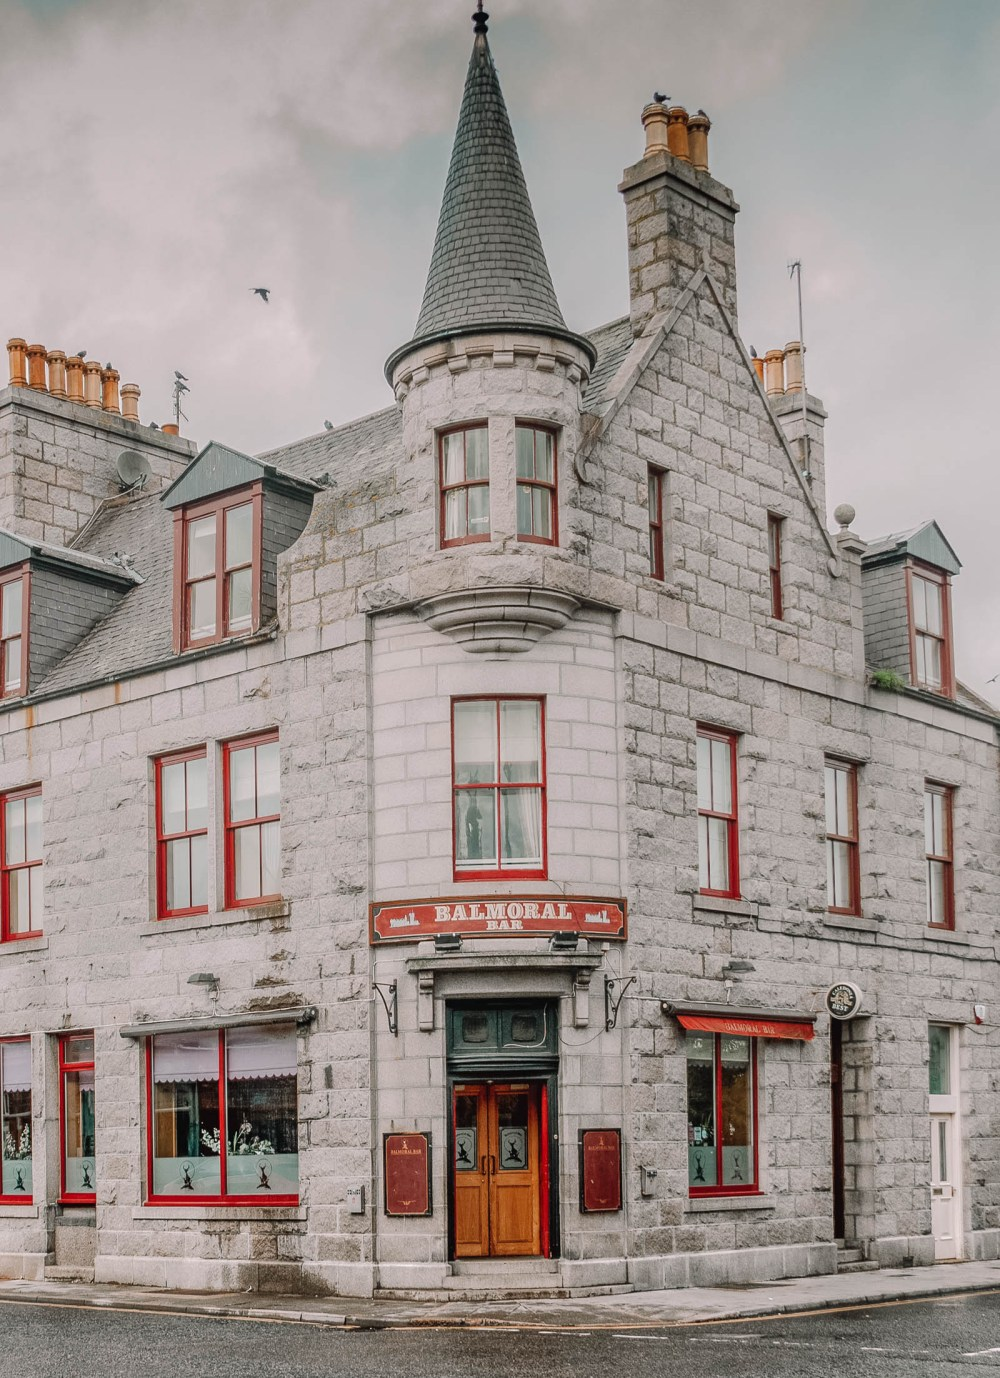 Villages In The Scottish Highlands To Visit (6)